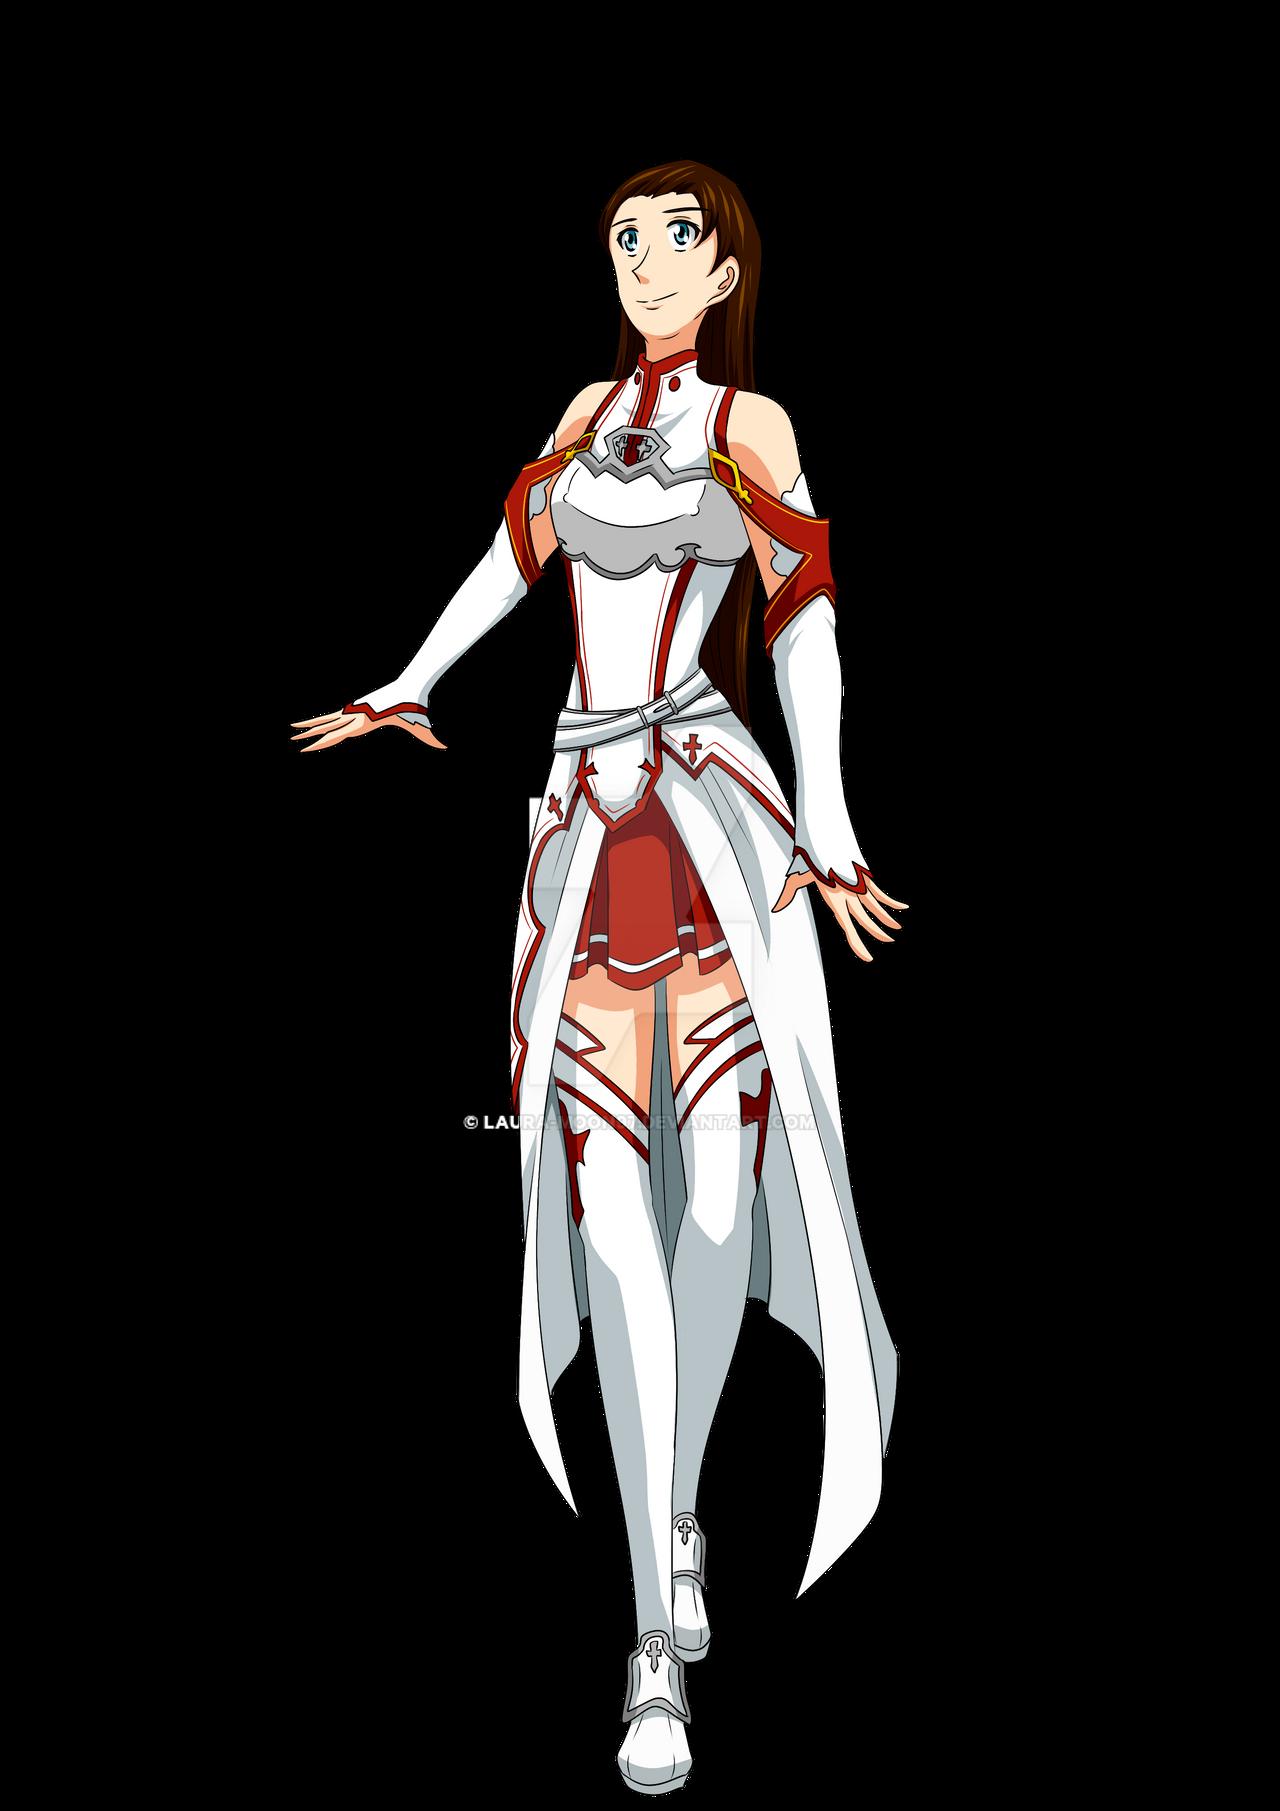 Felicia - Asuna's costume (SAO) by Laura-Moon97